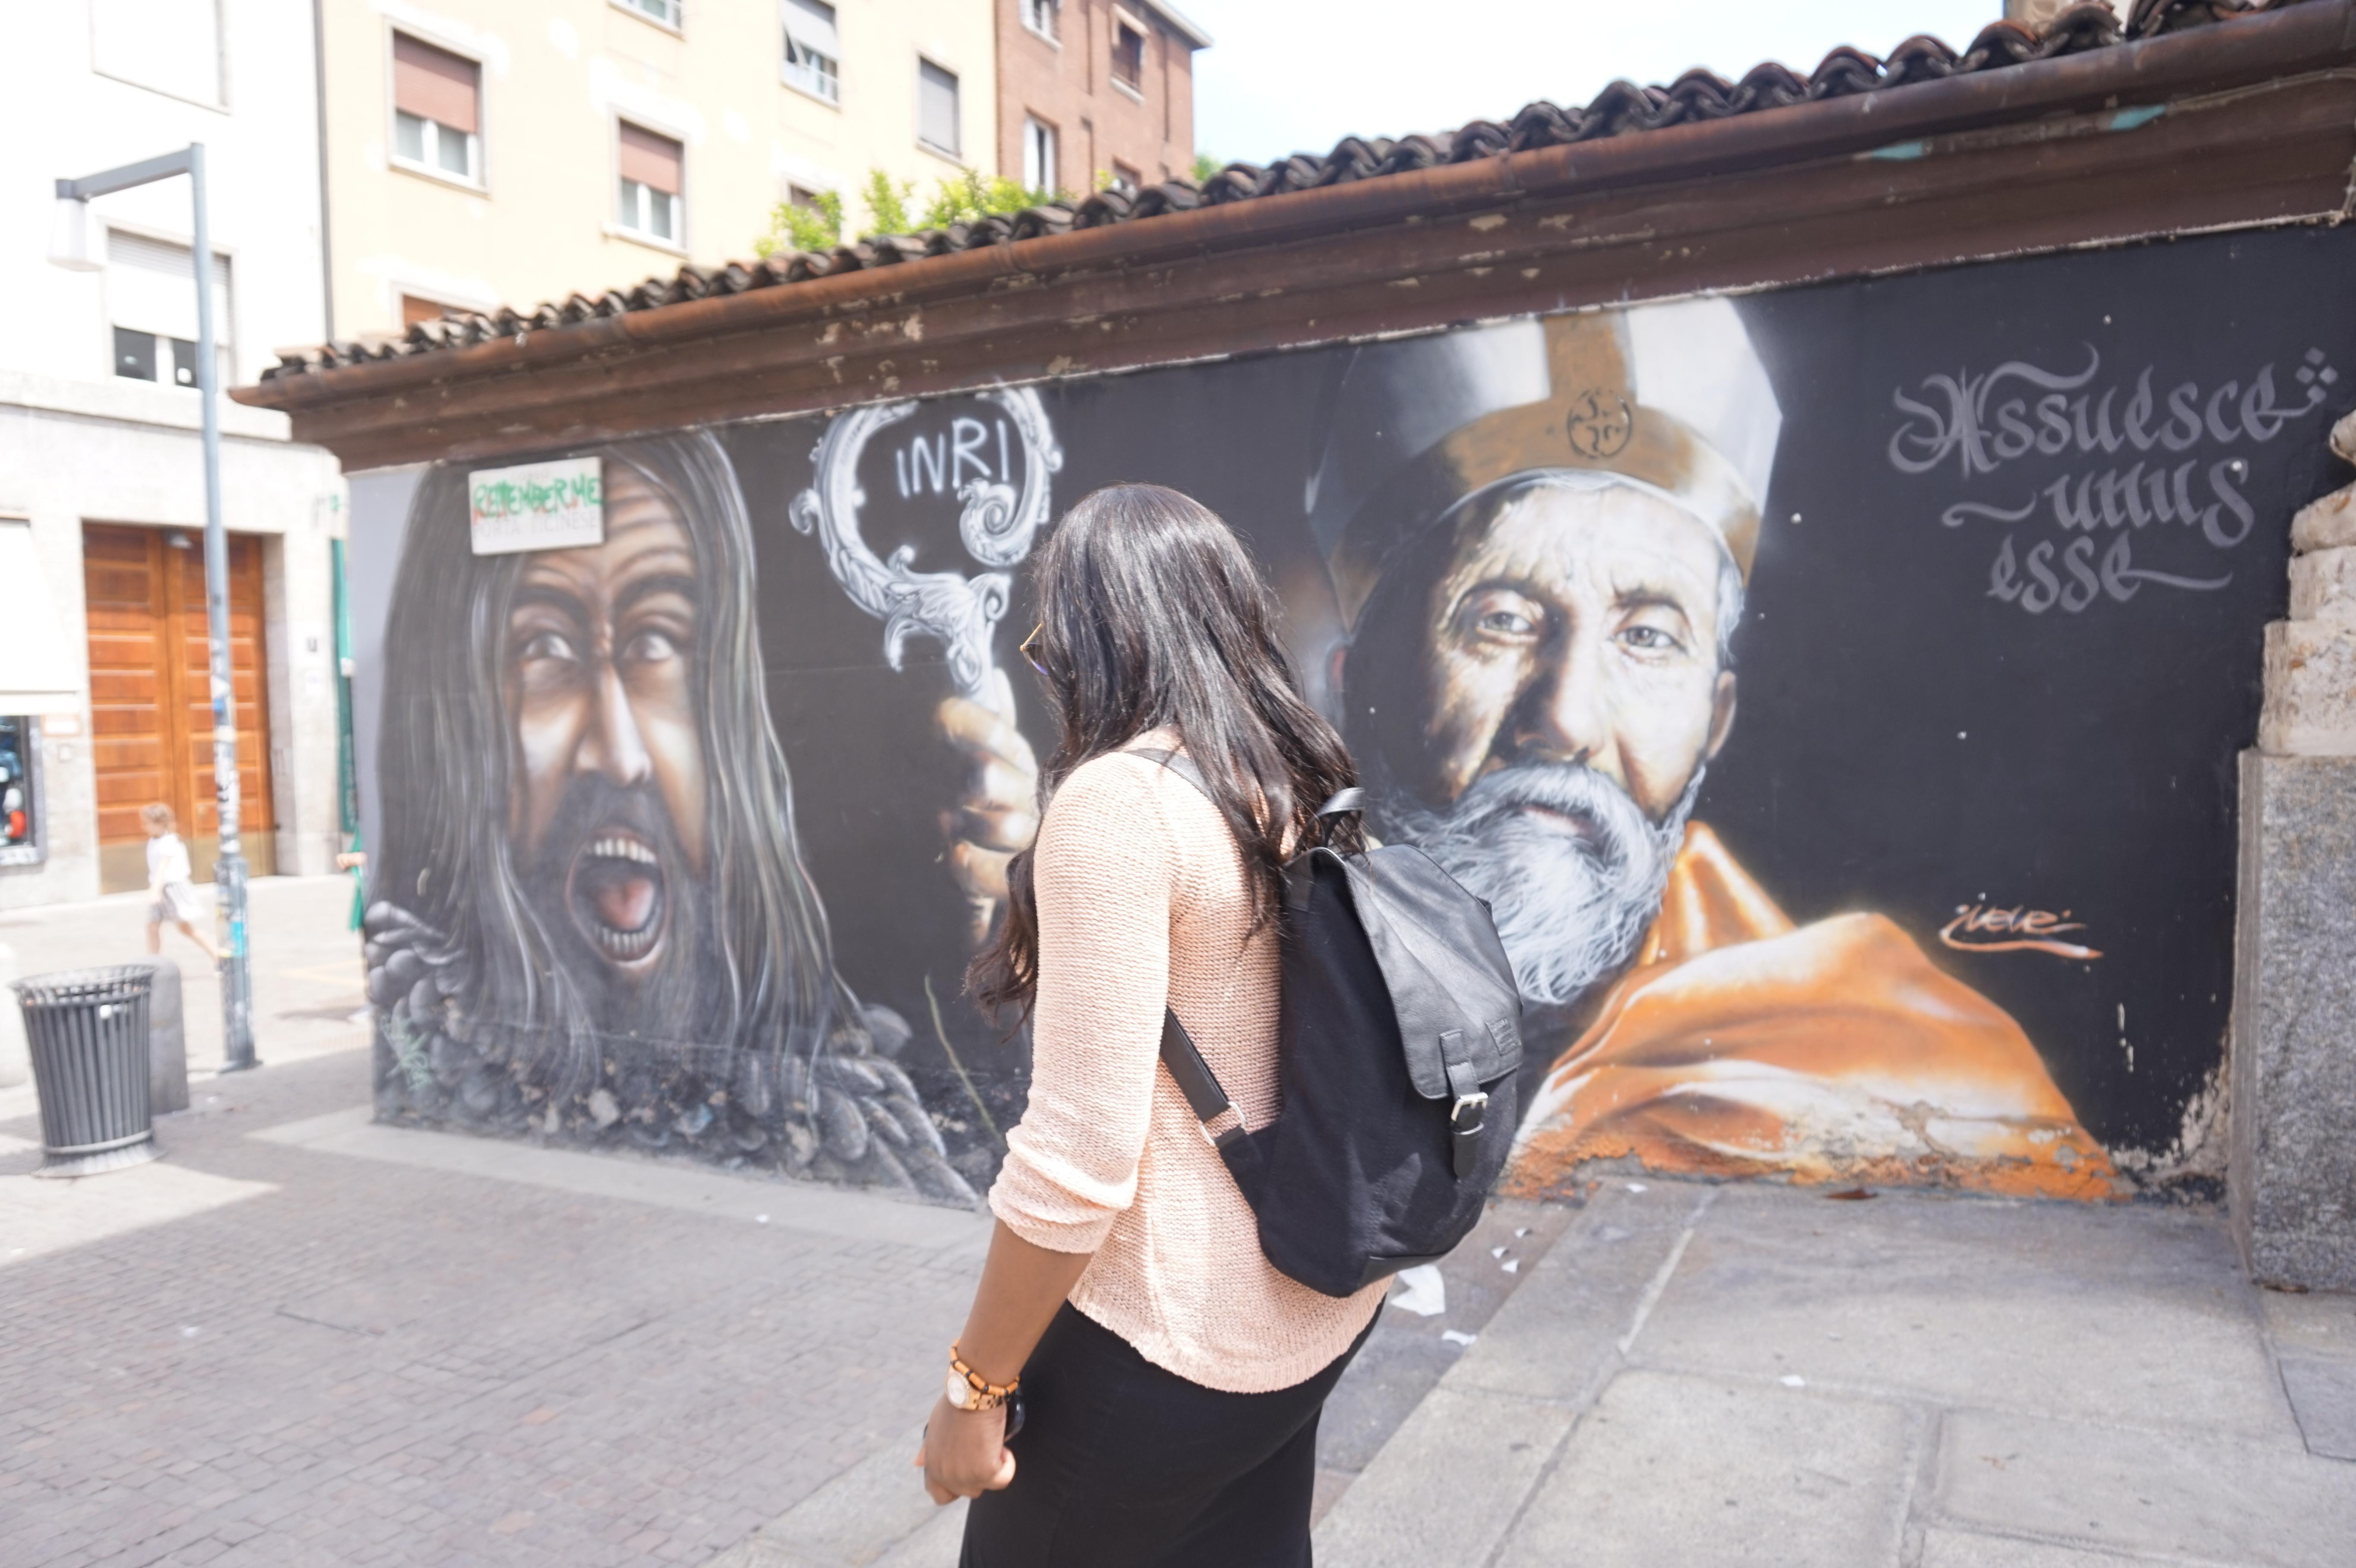 raychel-says-travel-street-art-milan-2017-images